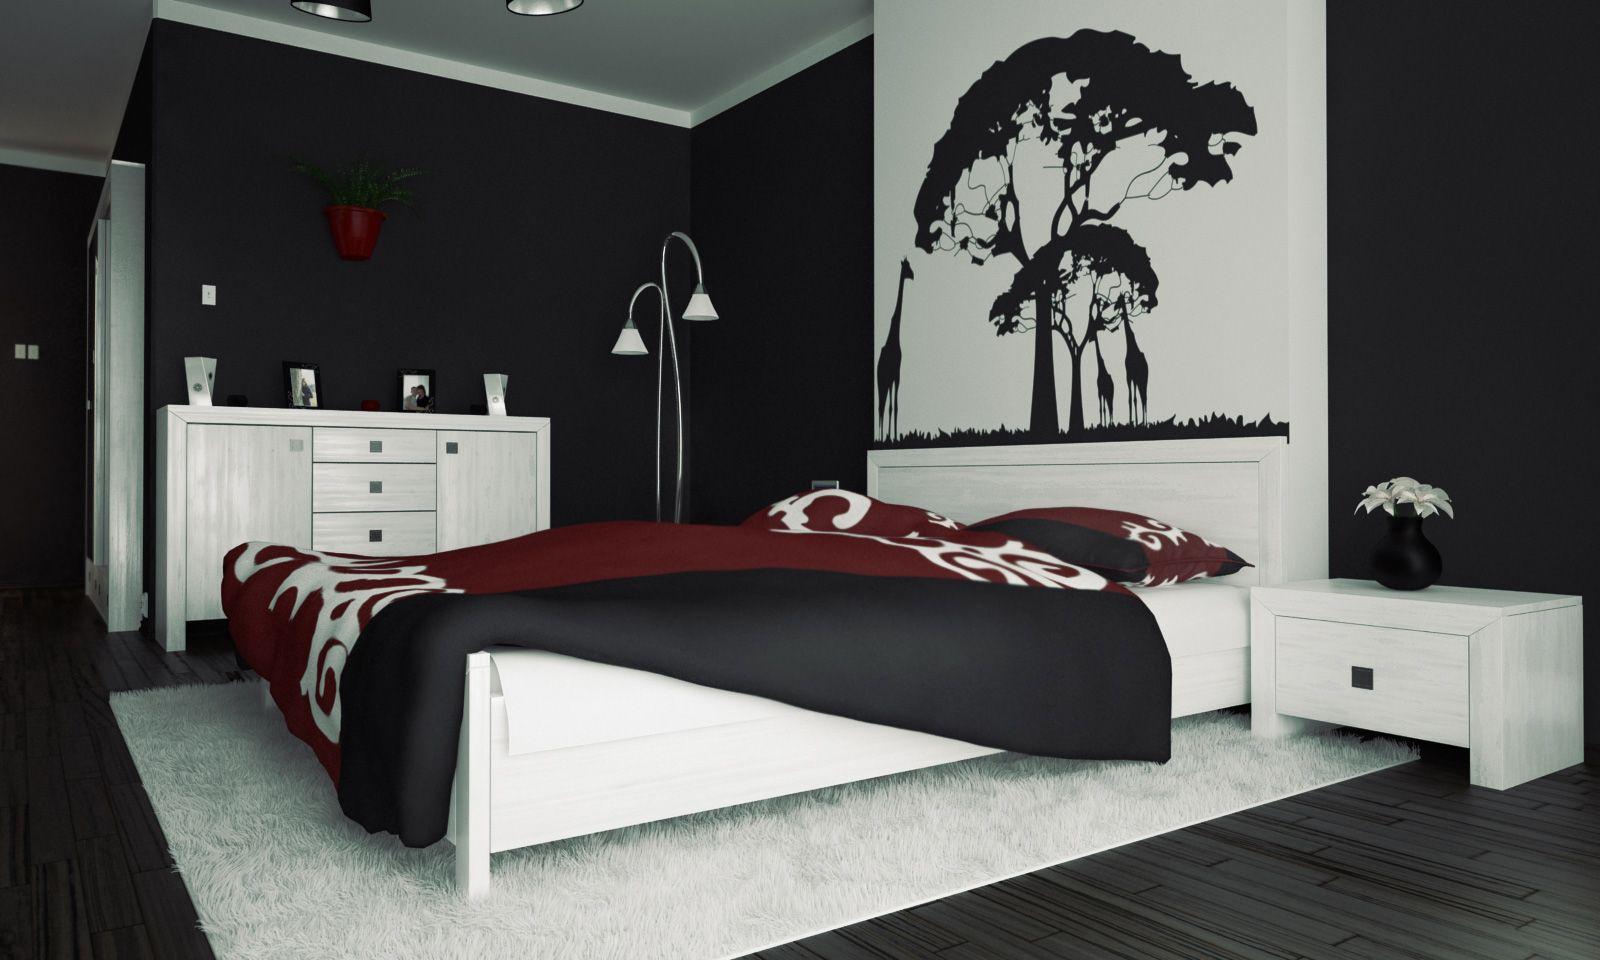 Fullsize Of Black Bedroom Decorations